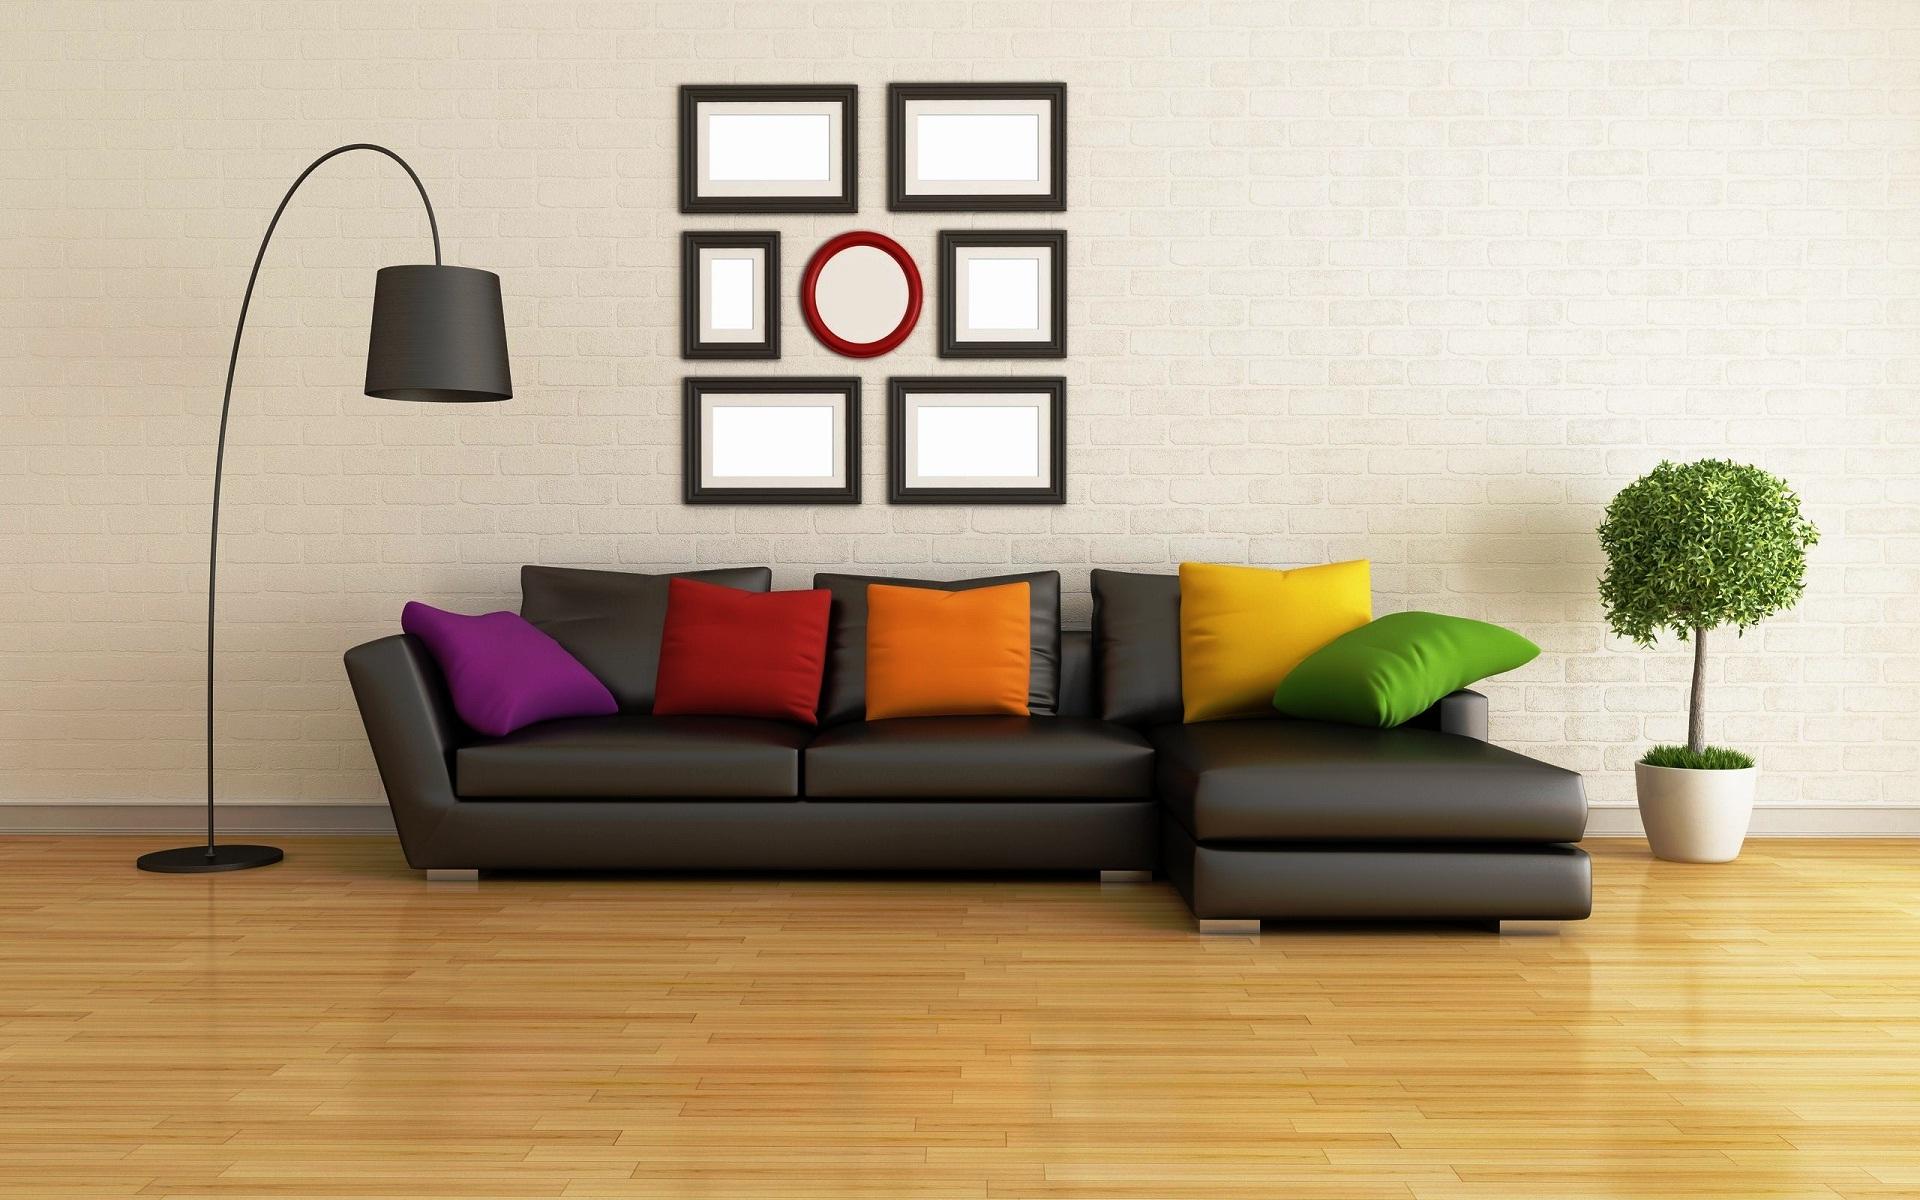 decorative pillows for dark brown sofa mart broadway denver co interior wallpapers hd download free | pixelstalk.net